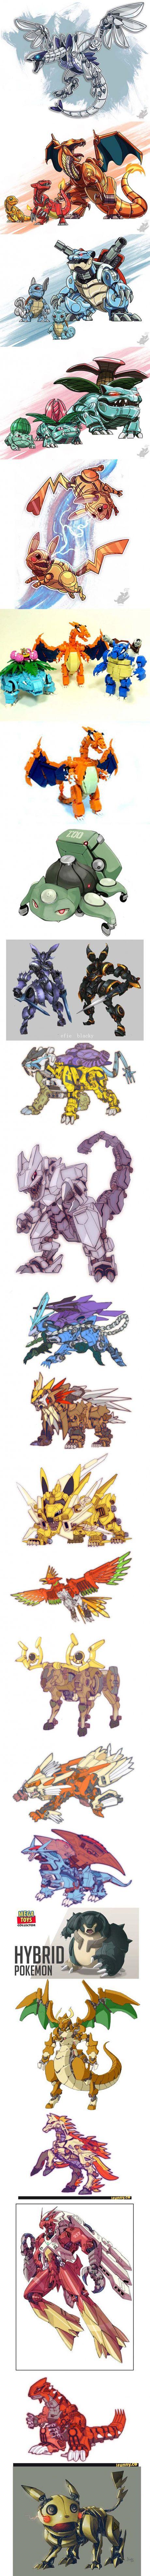 Pokémon - Robo Starters